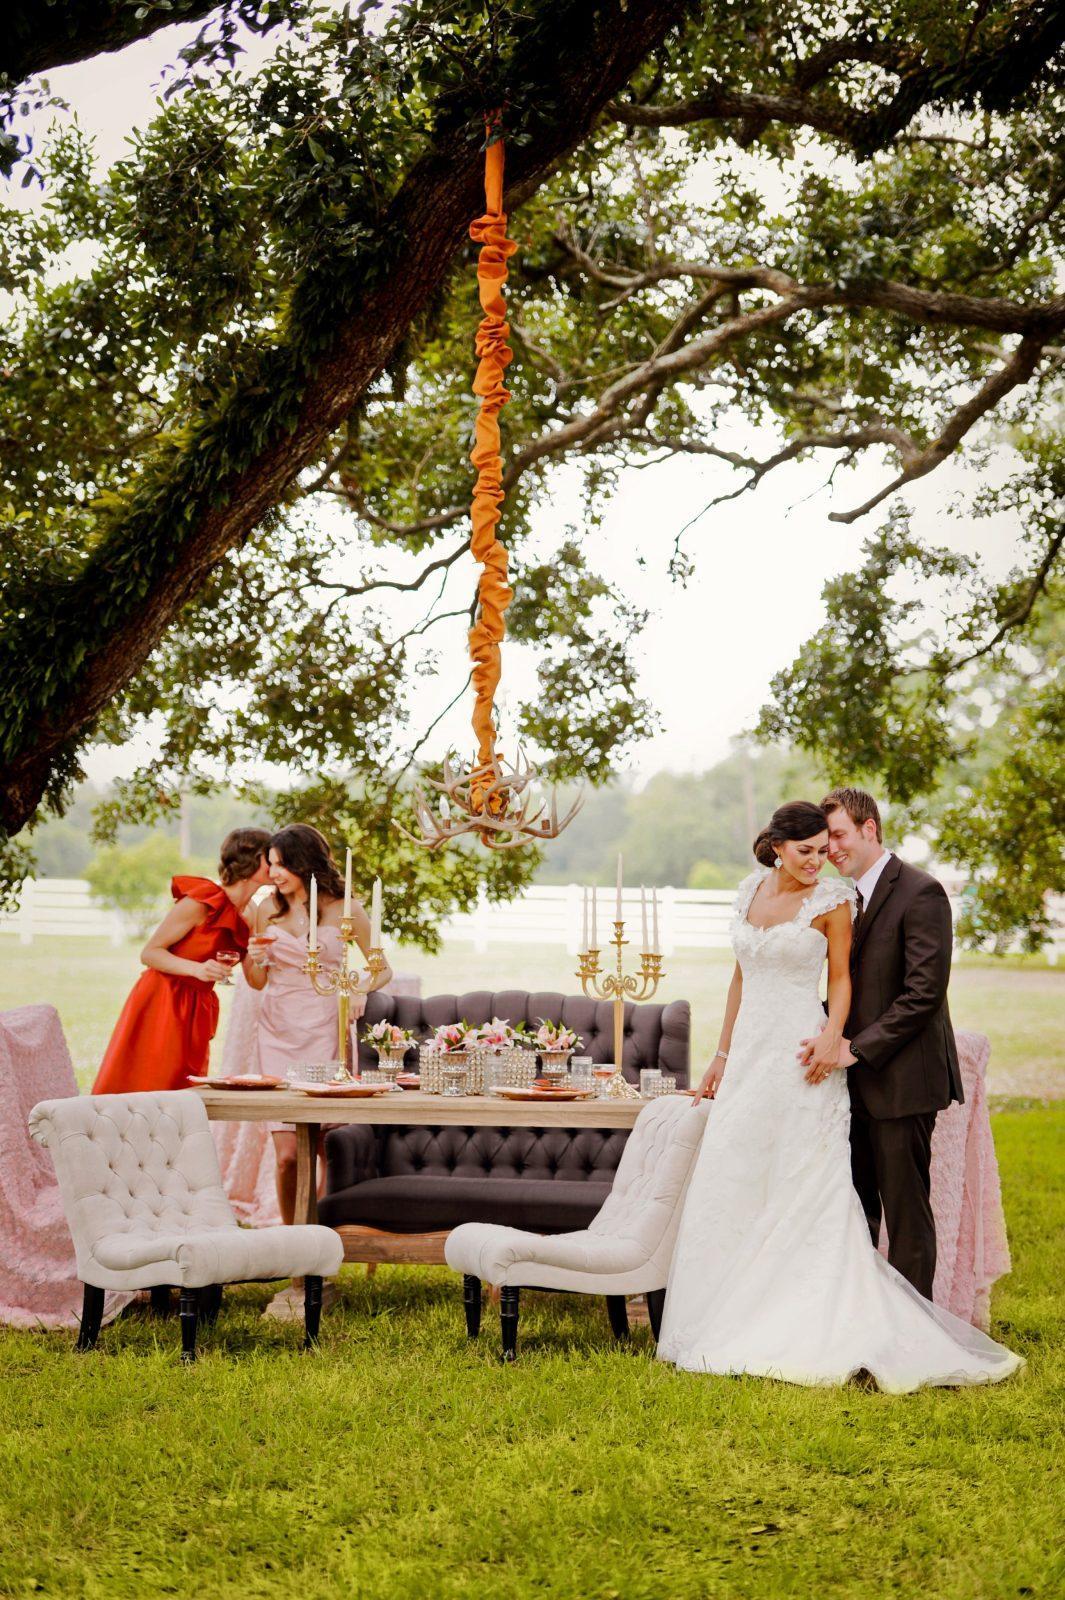 Outdoor Fall Wedding | Photo: Studio Tran